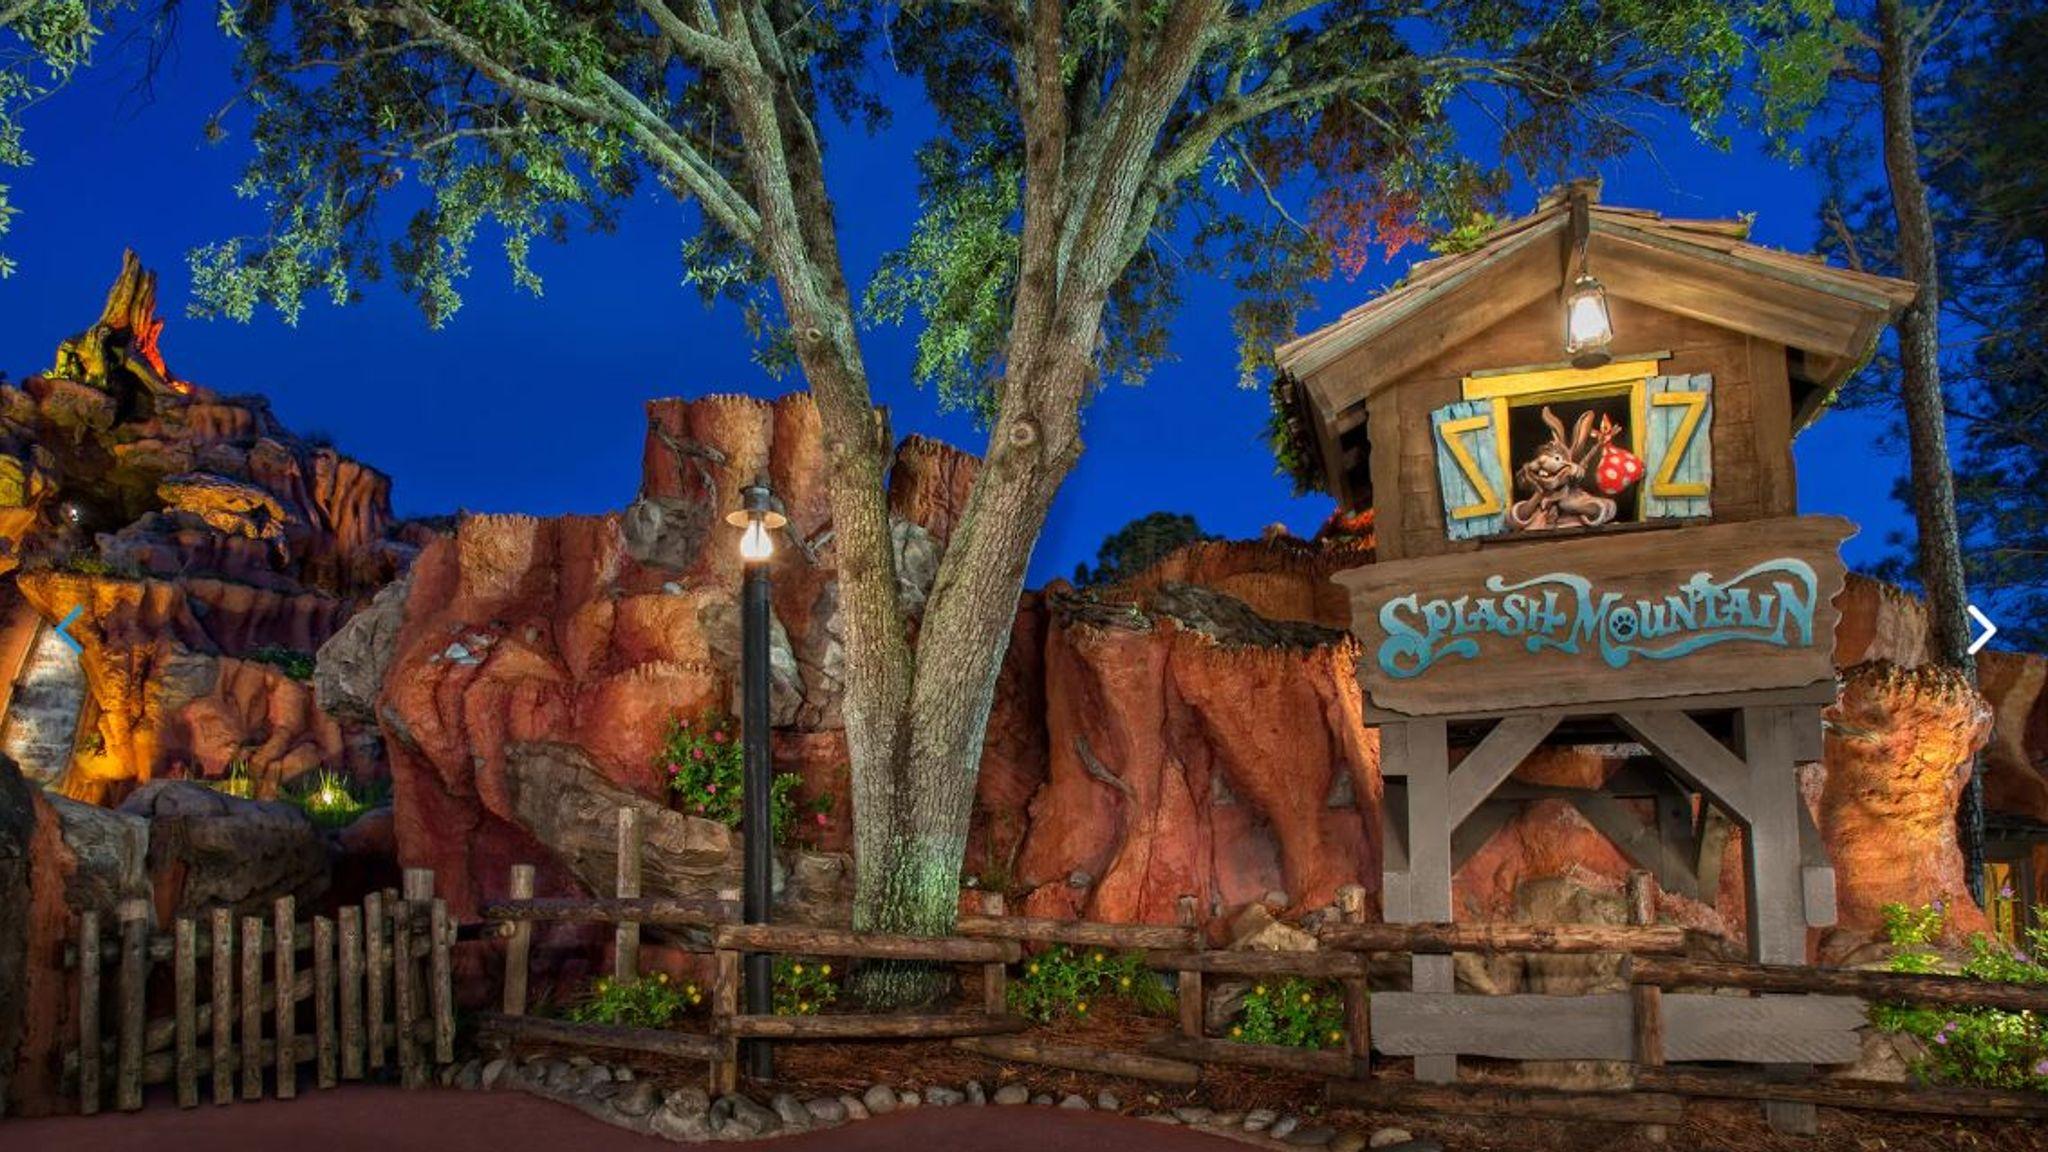 Black Lives Matter Disney Ditches Controversial Theme Of Splash